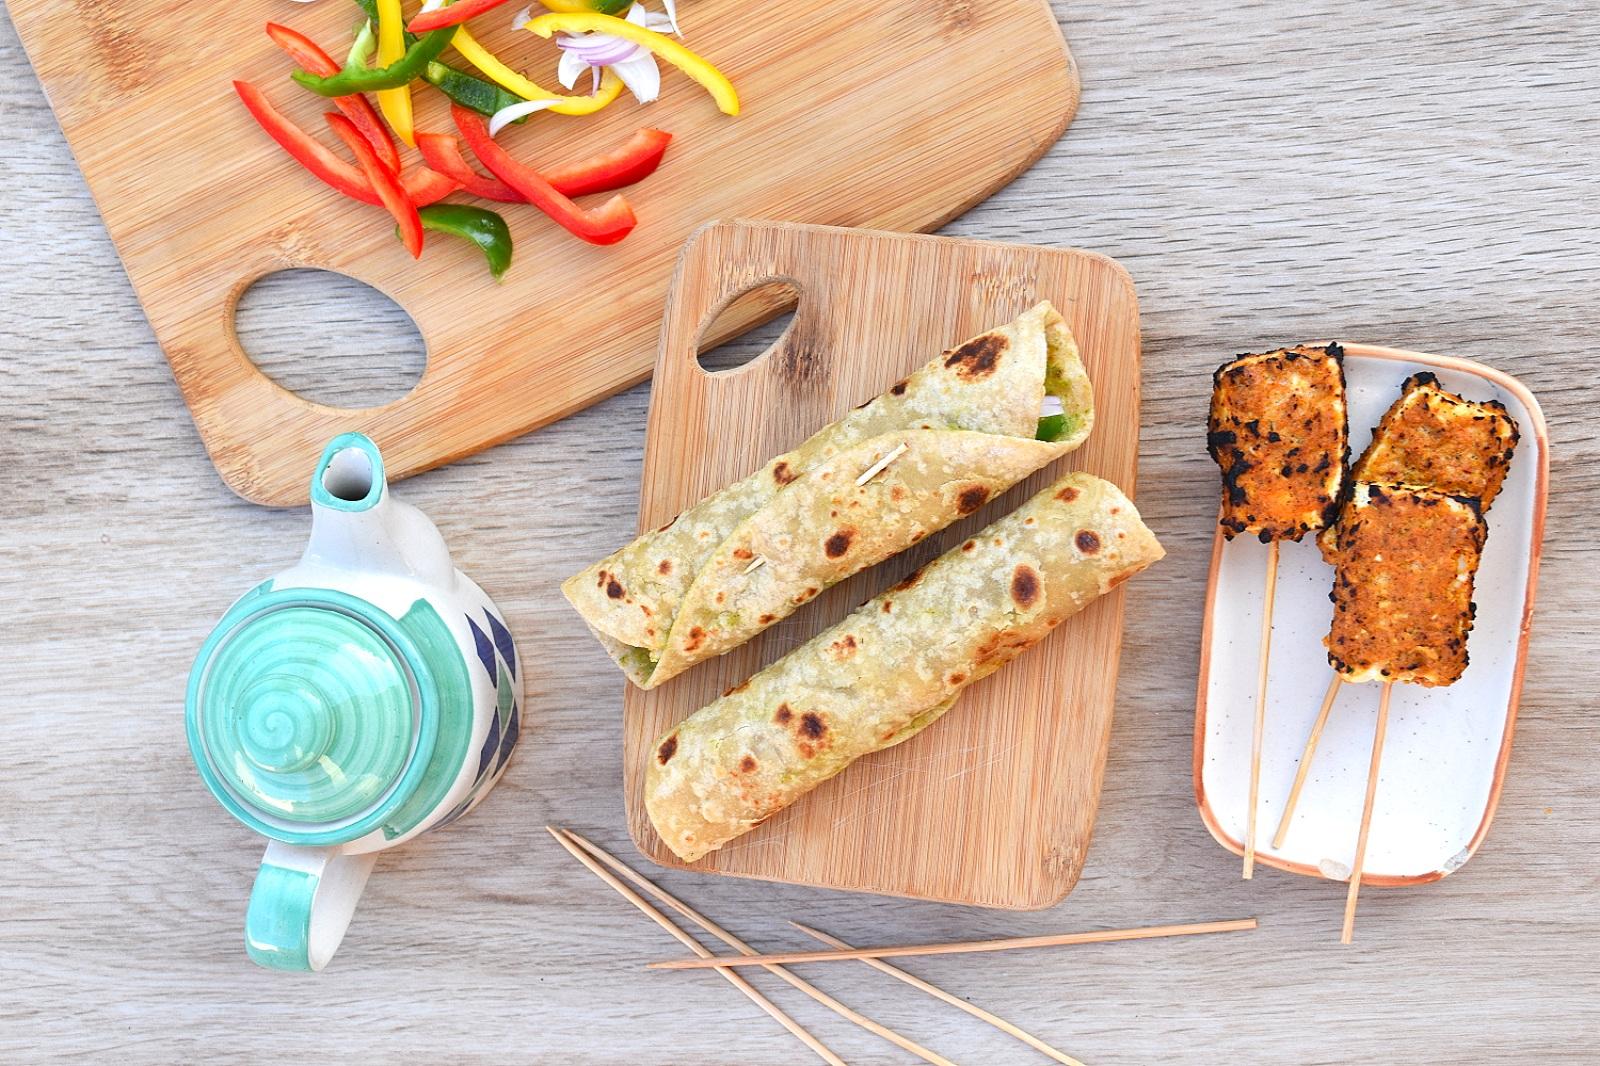 Indian Breakfast Recipes - Kathi Roll